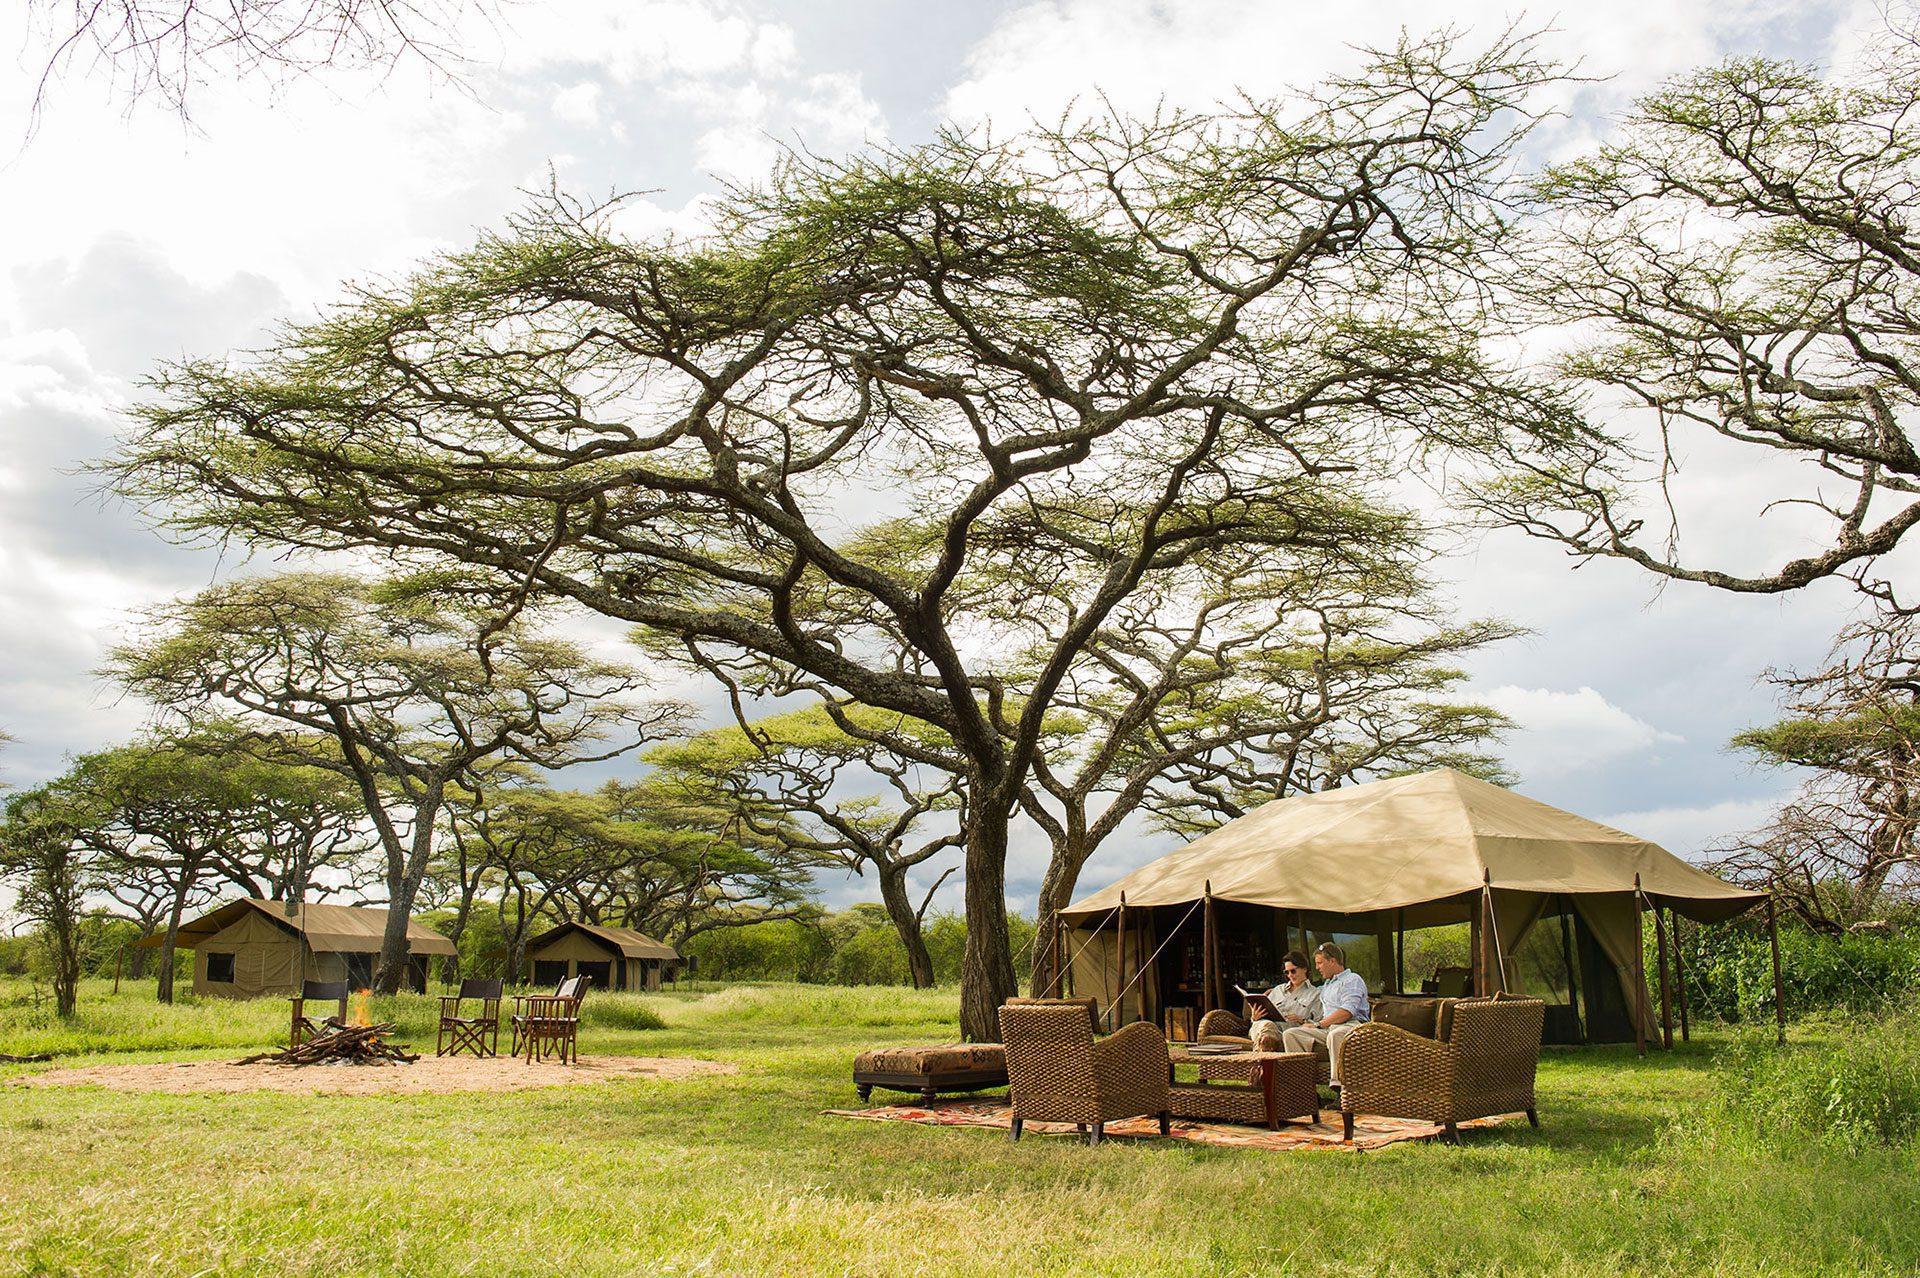 legendary serengeti mobile camp with tree on Africa safari